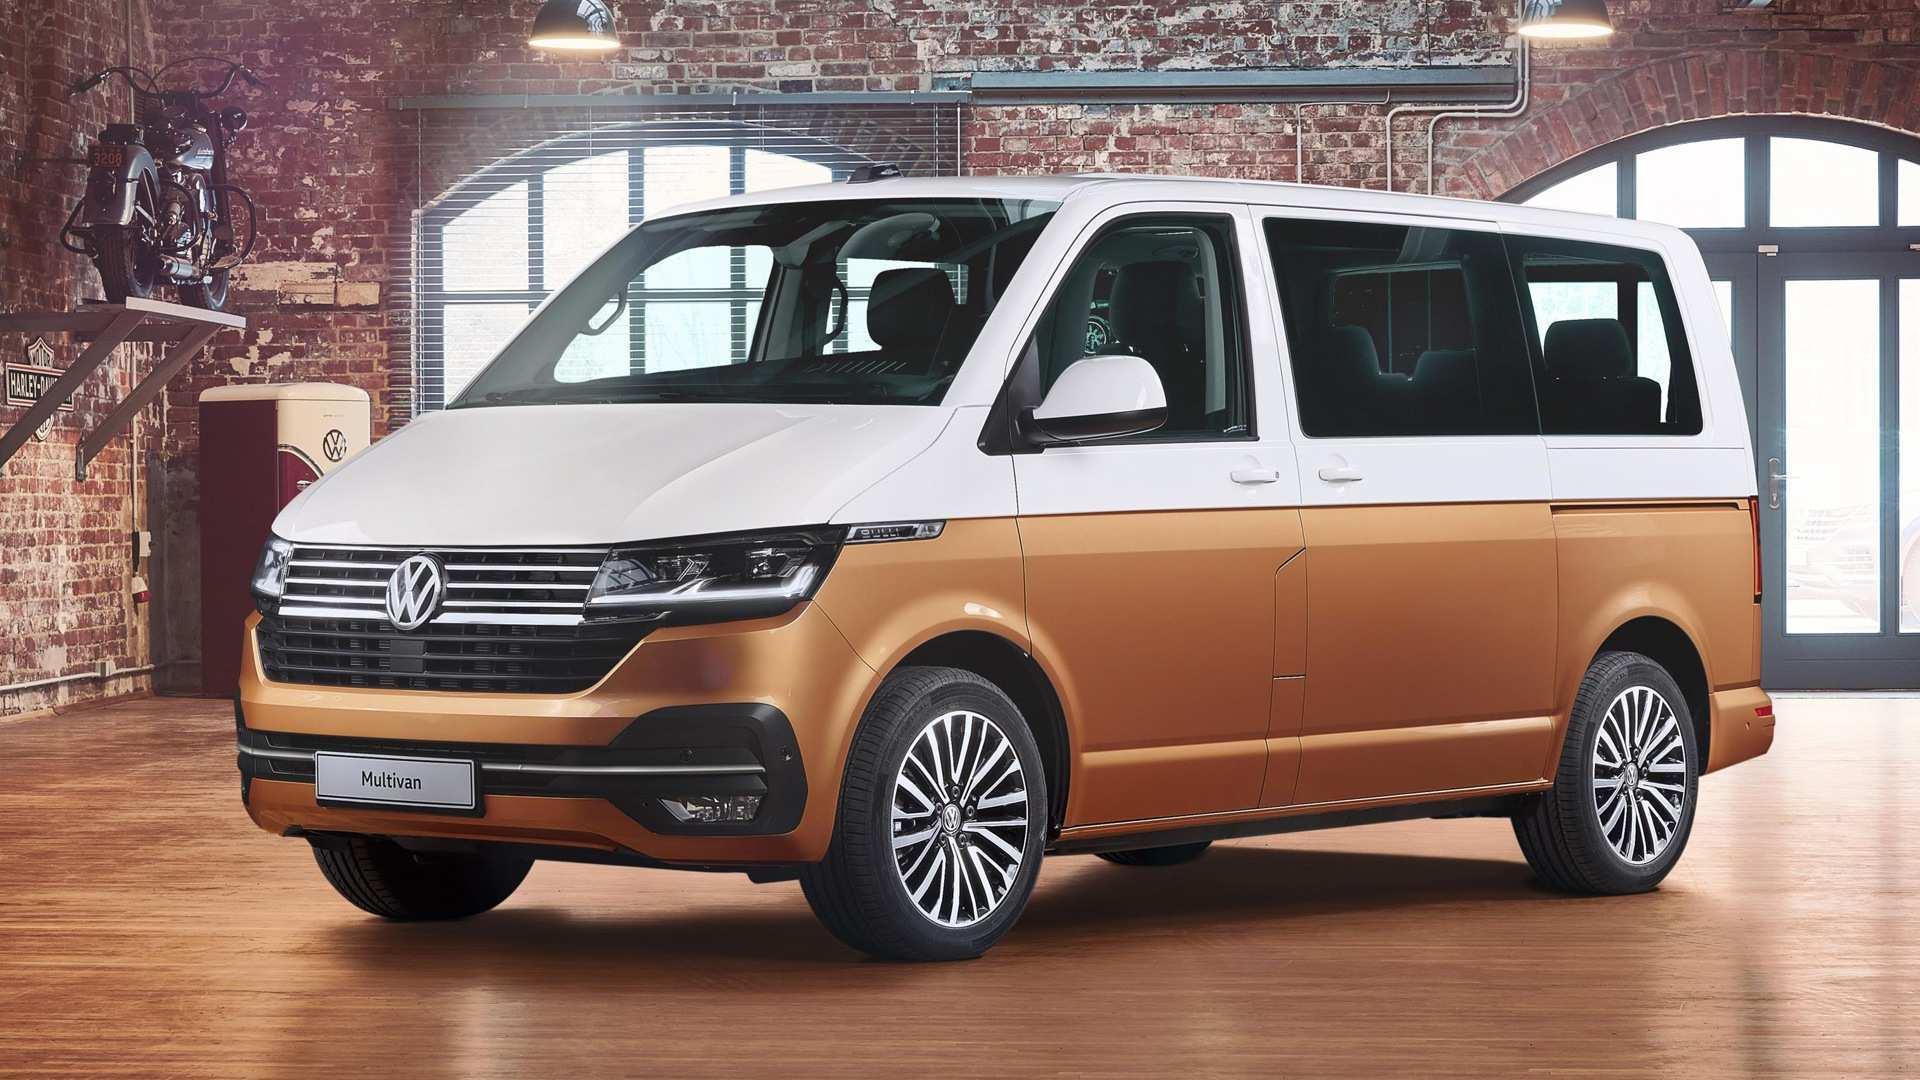 89 All New Volkswagen Transporter 2020 Price with Volkswagen Transporter 2020